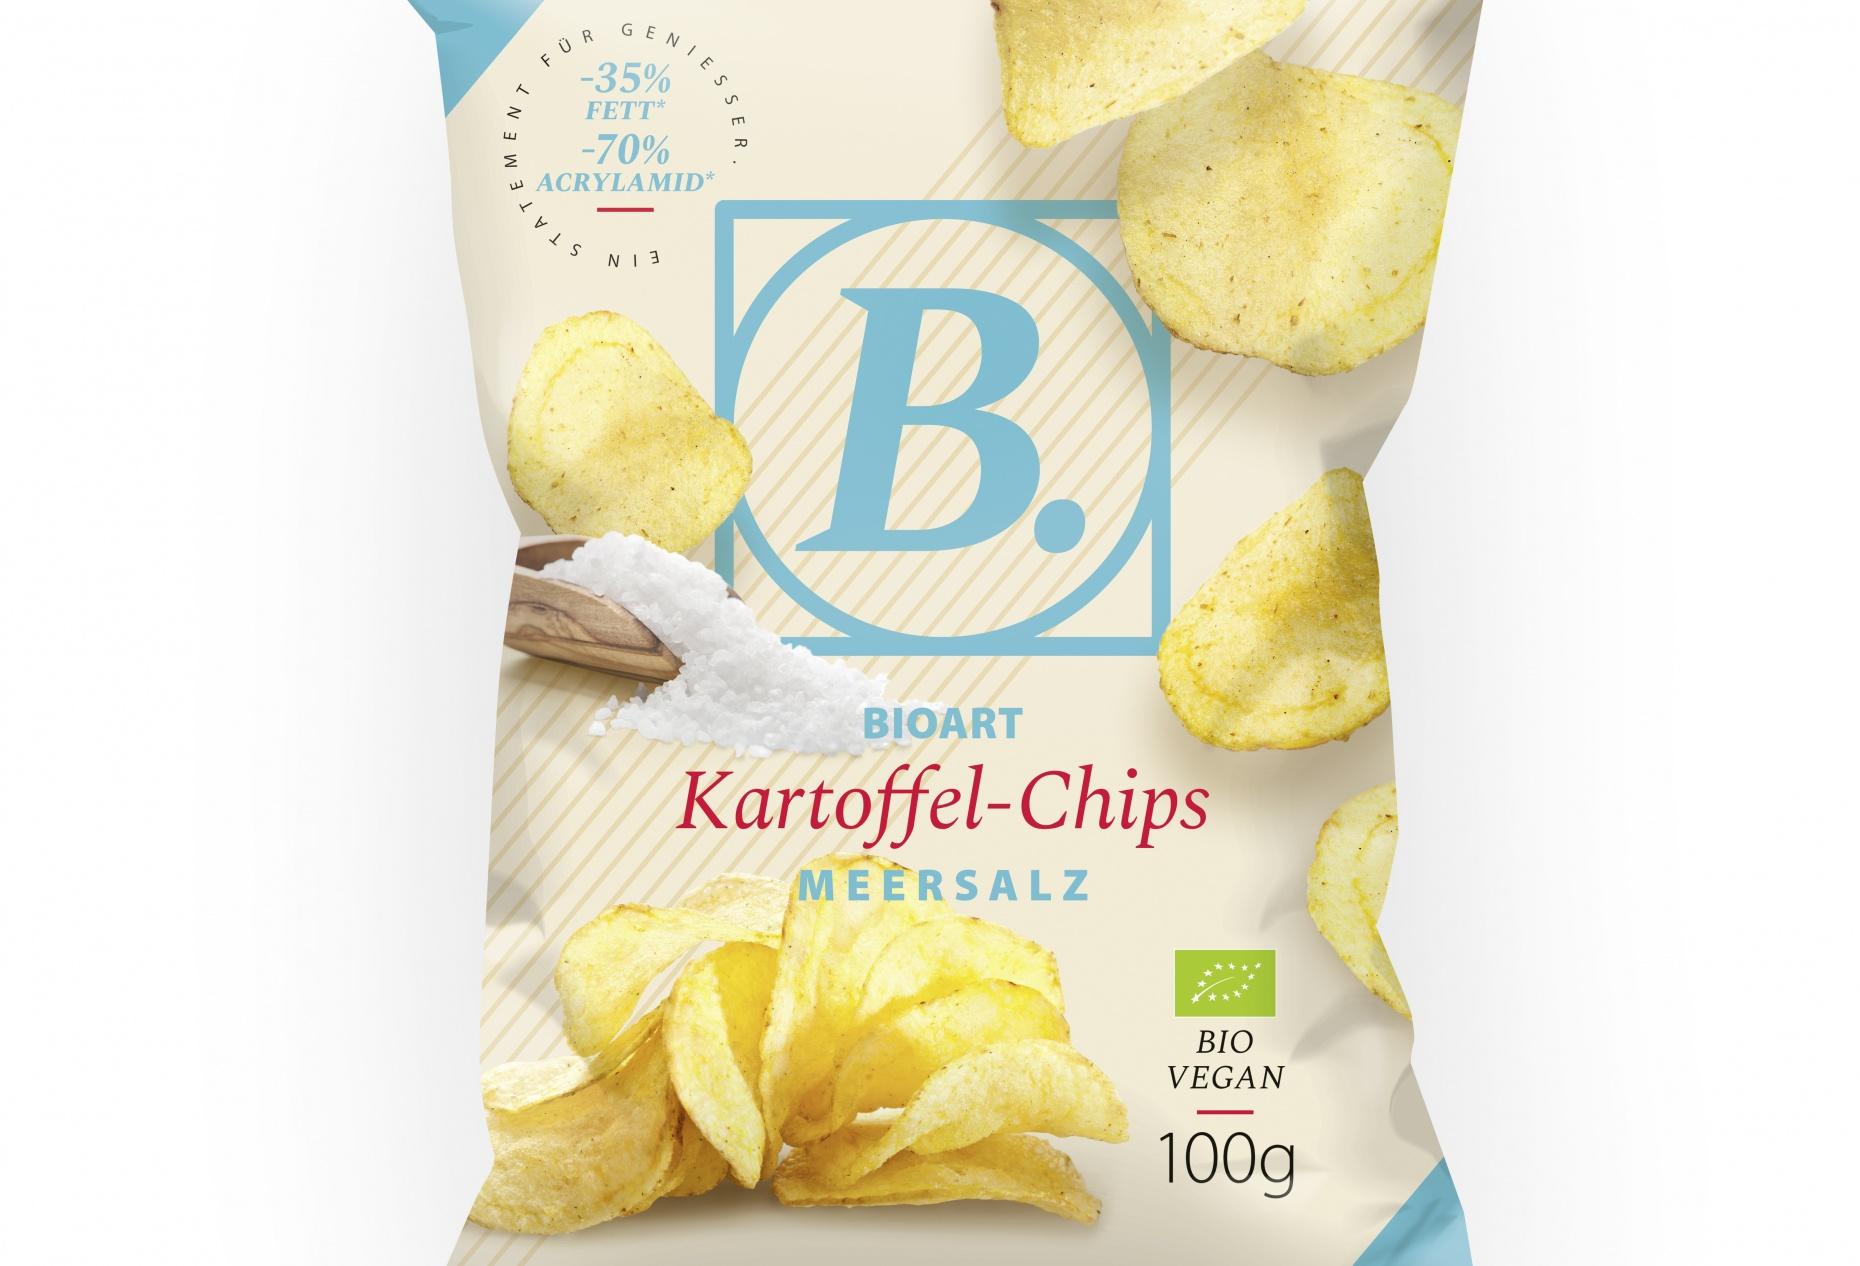 BioArt_Chips_Kartoffel_Meersalz_100g_Packshot_010721_eciRGBv2